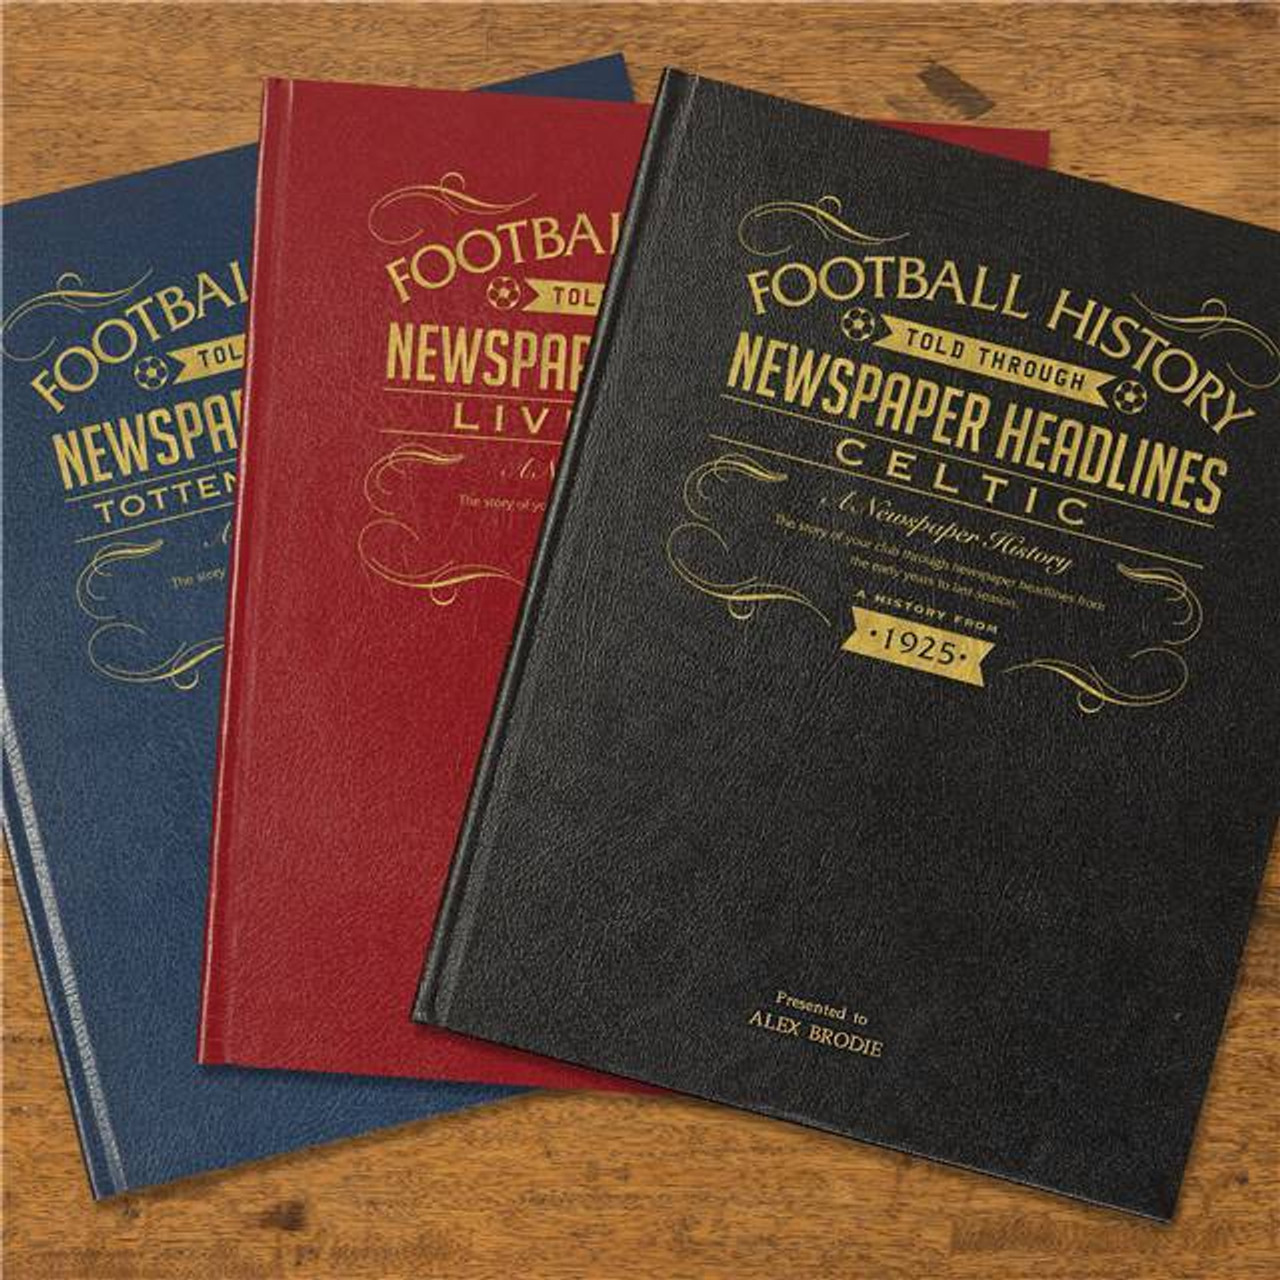 Football Newspaper Books